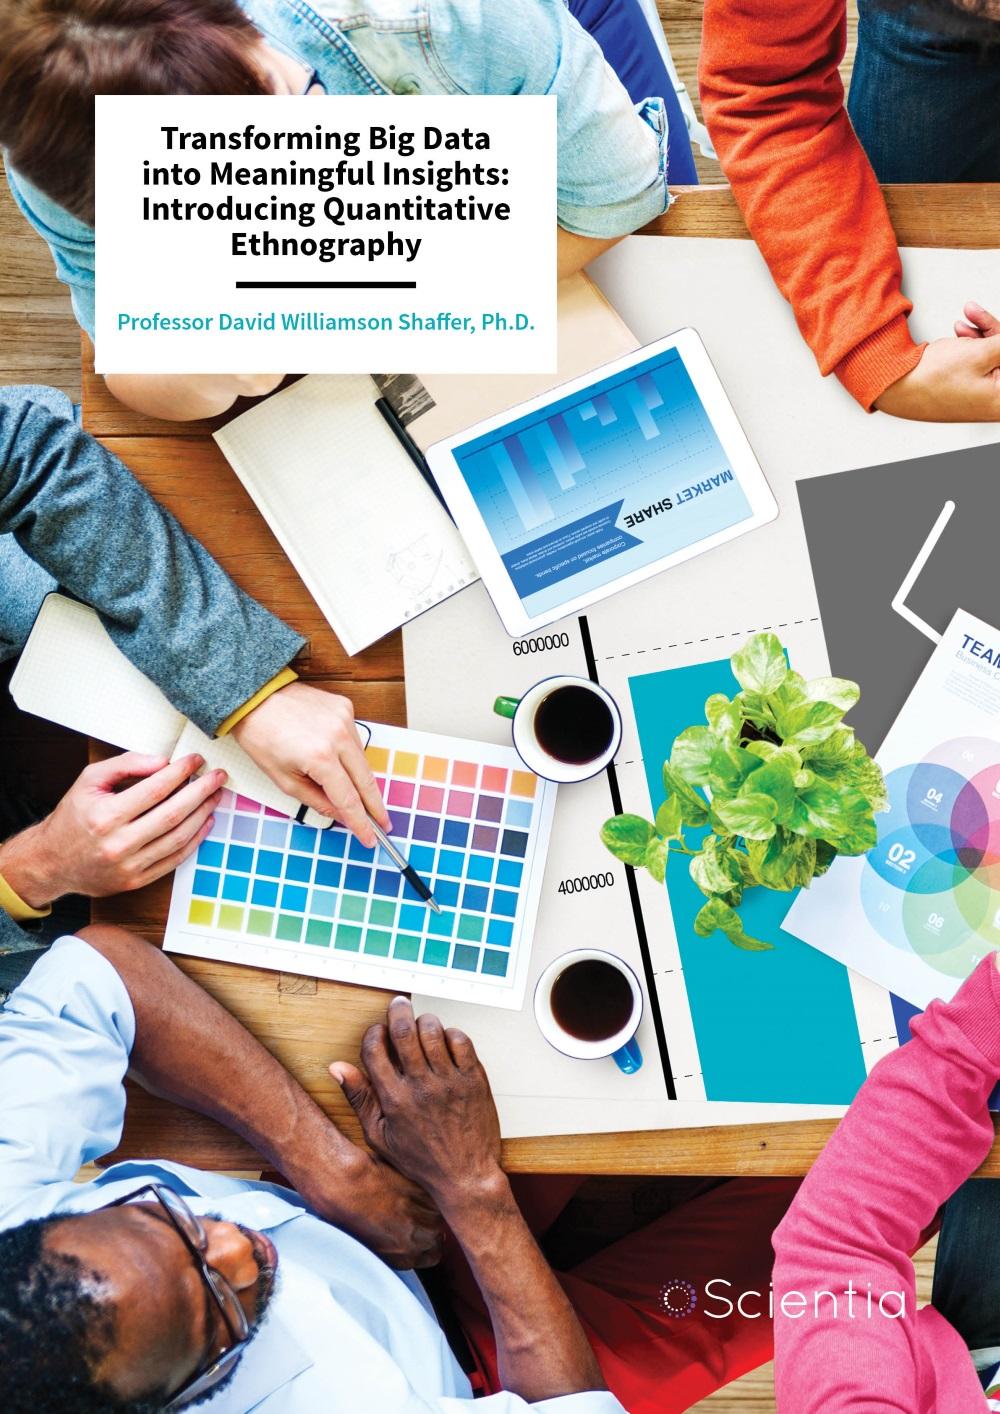 Professor David Williamson Shaffer – Transforming Big Data into Meaningful Insights: Introducing Quantitative Ethnography